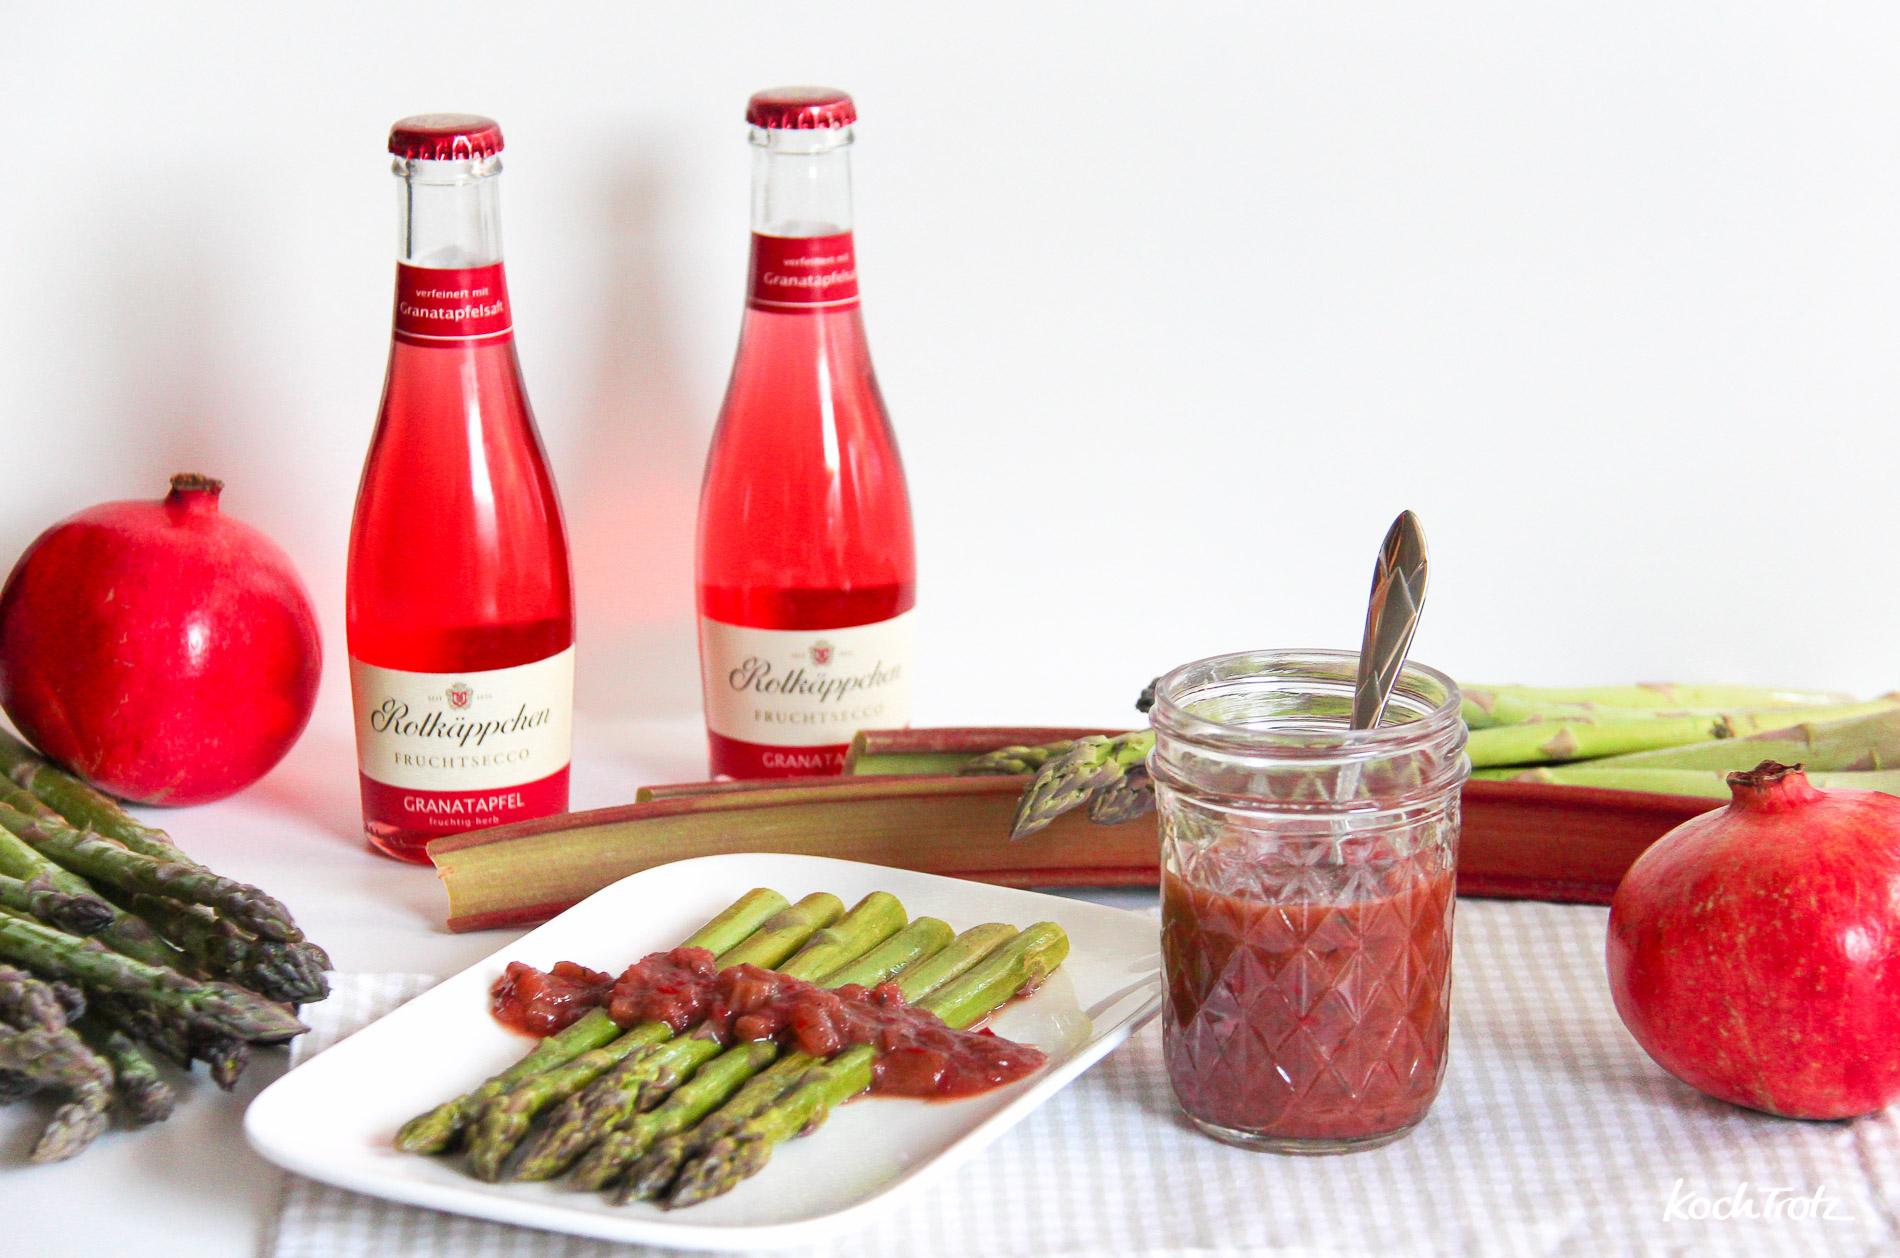 rotkaeppchen-frusecco-granatapfel-rhabarber-chutney--1-2